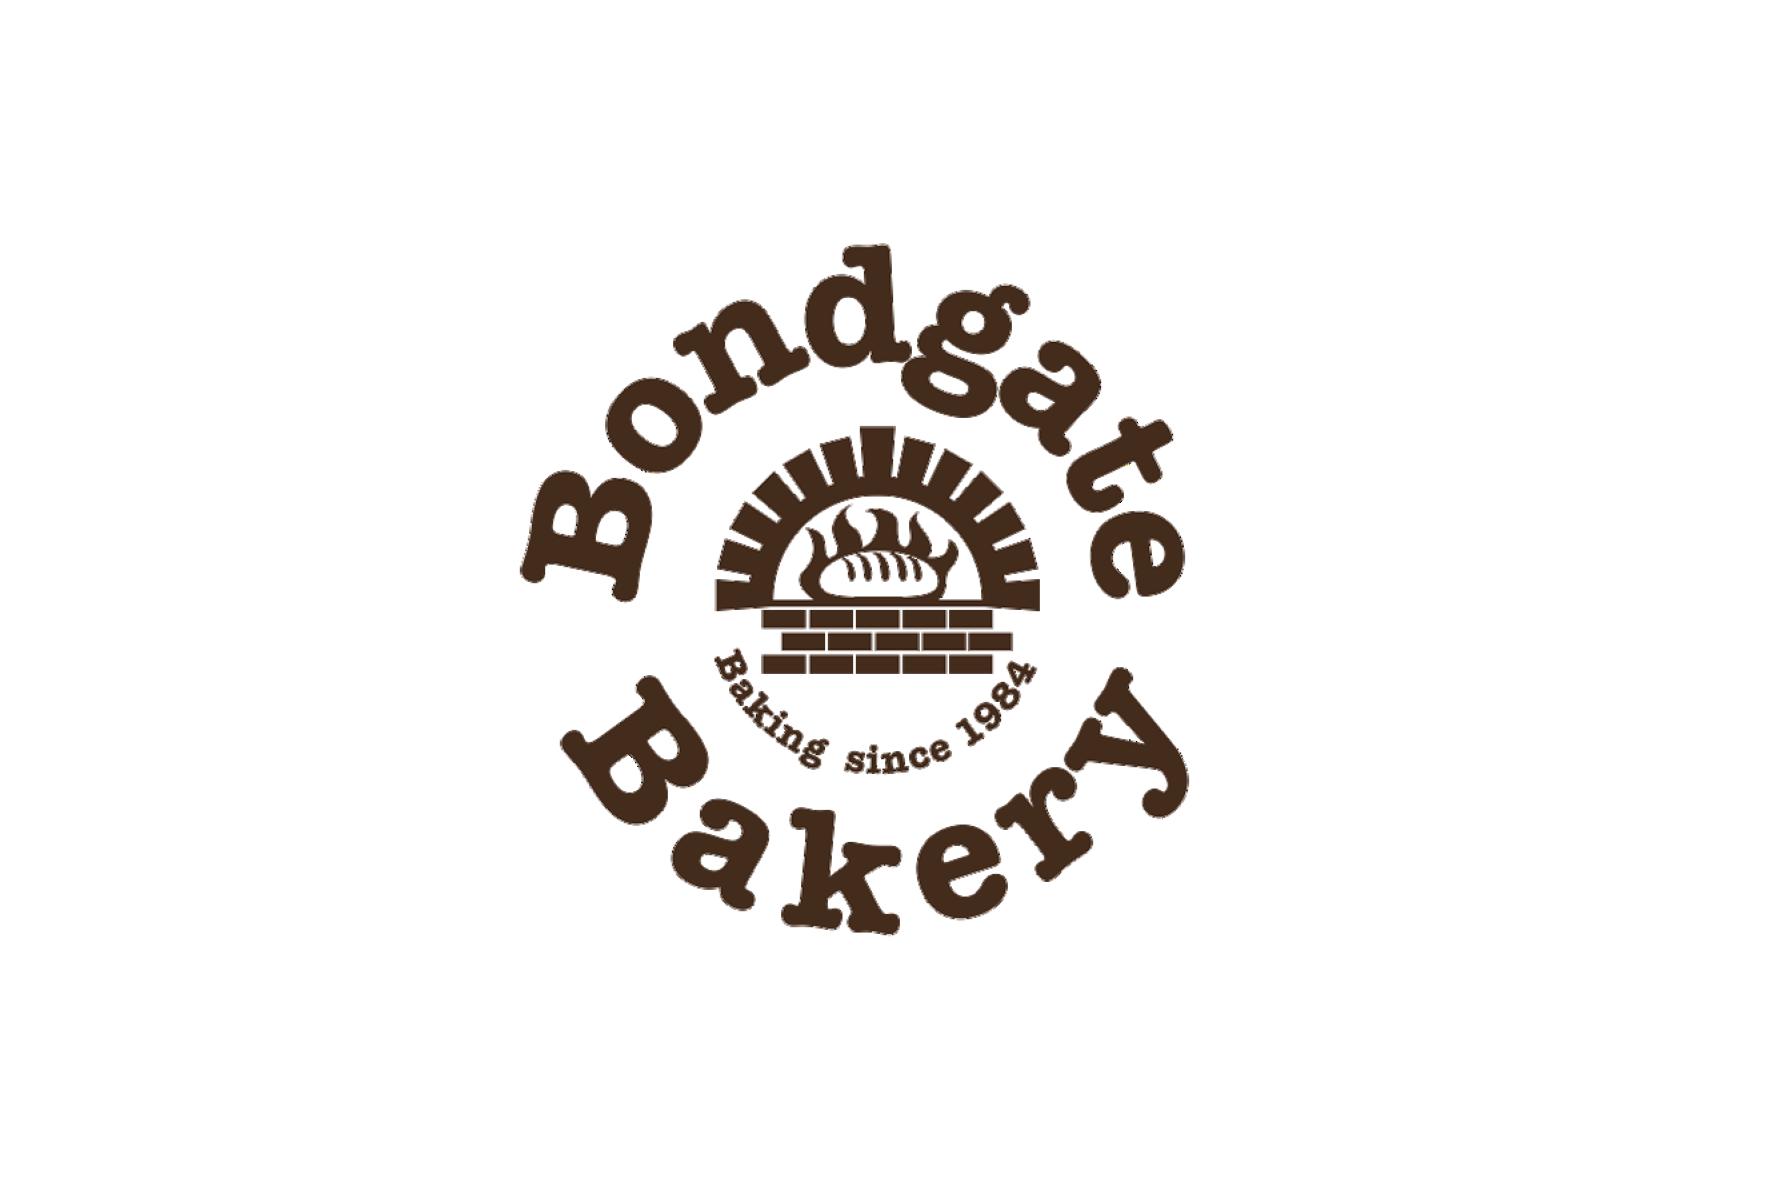 twenty8_coffee_suppliers2.png